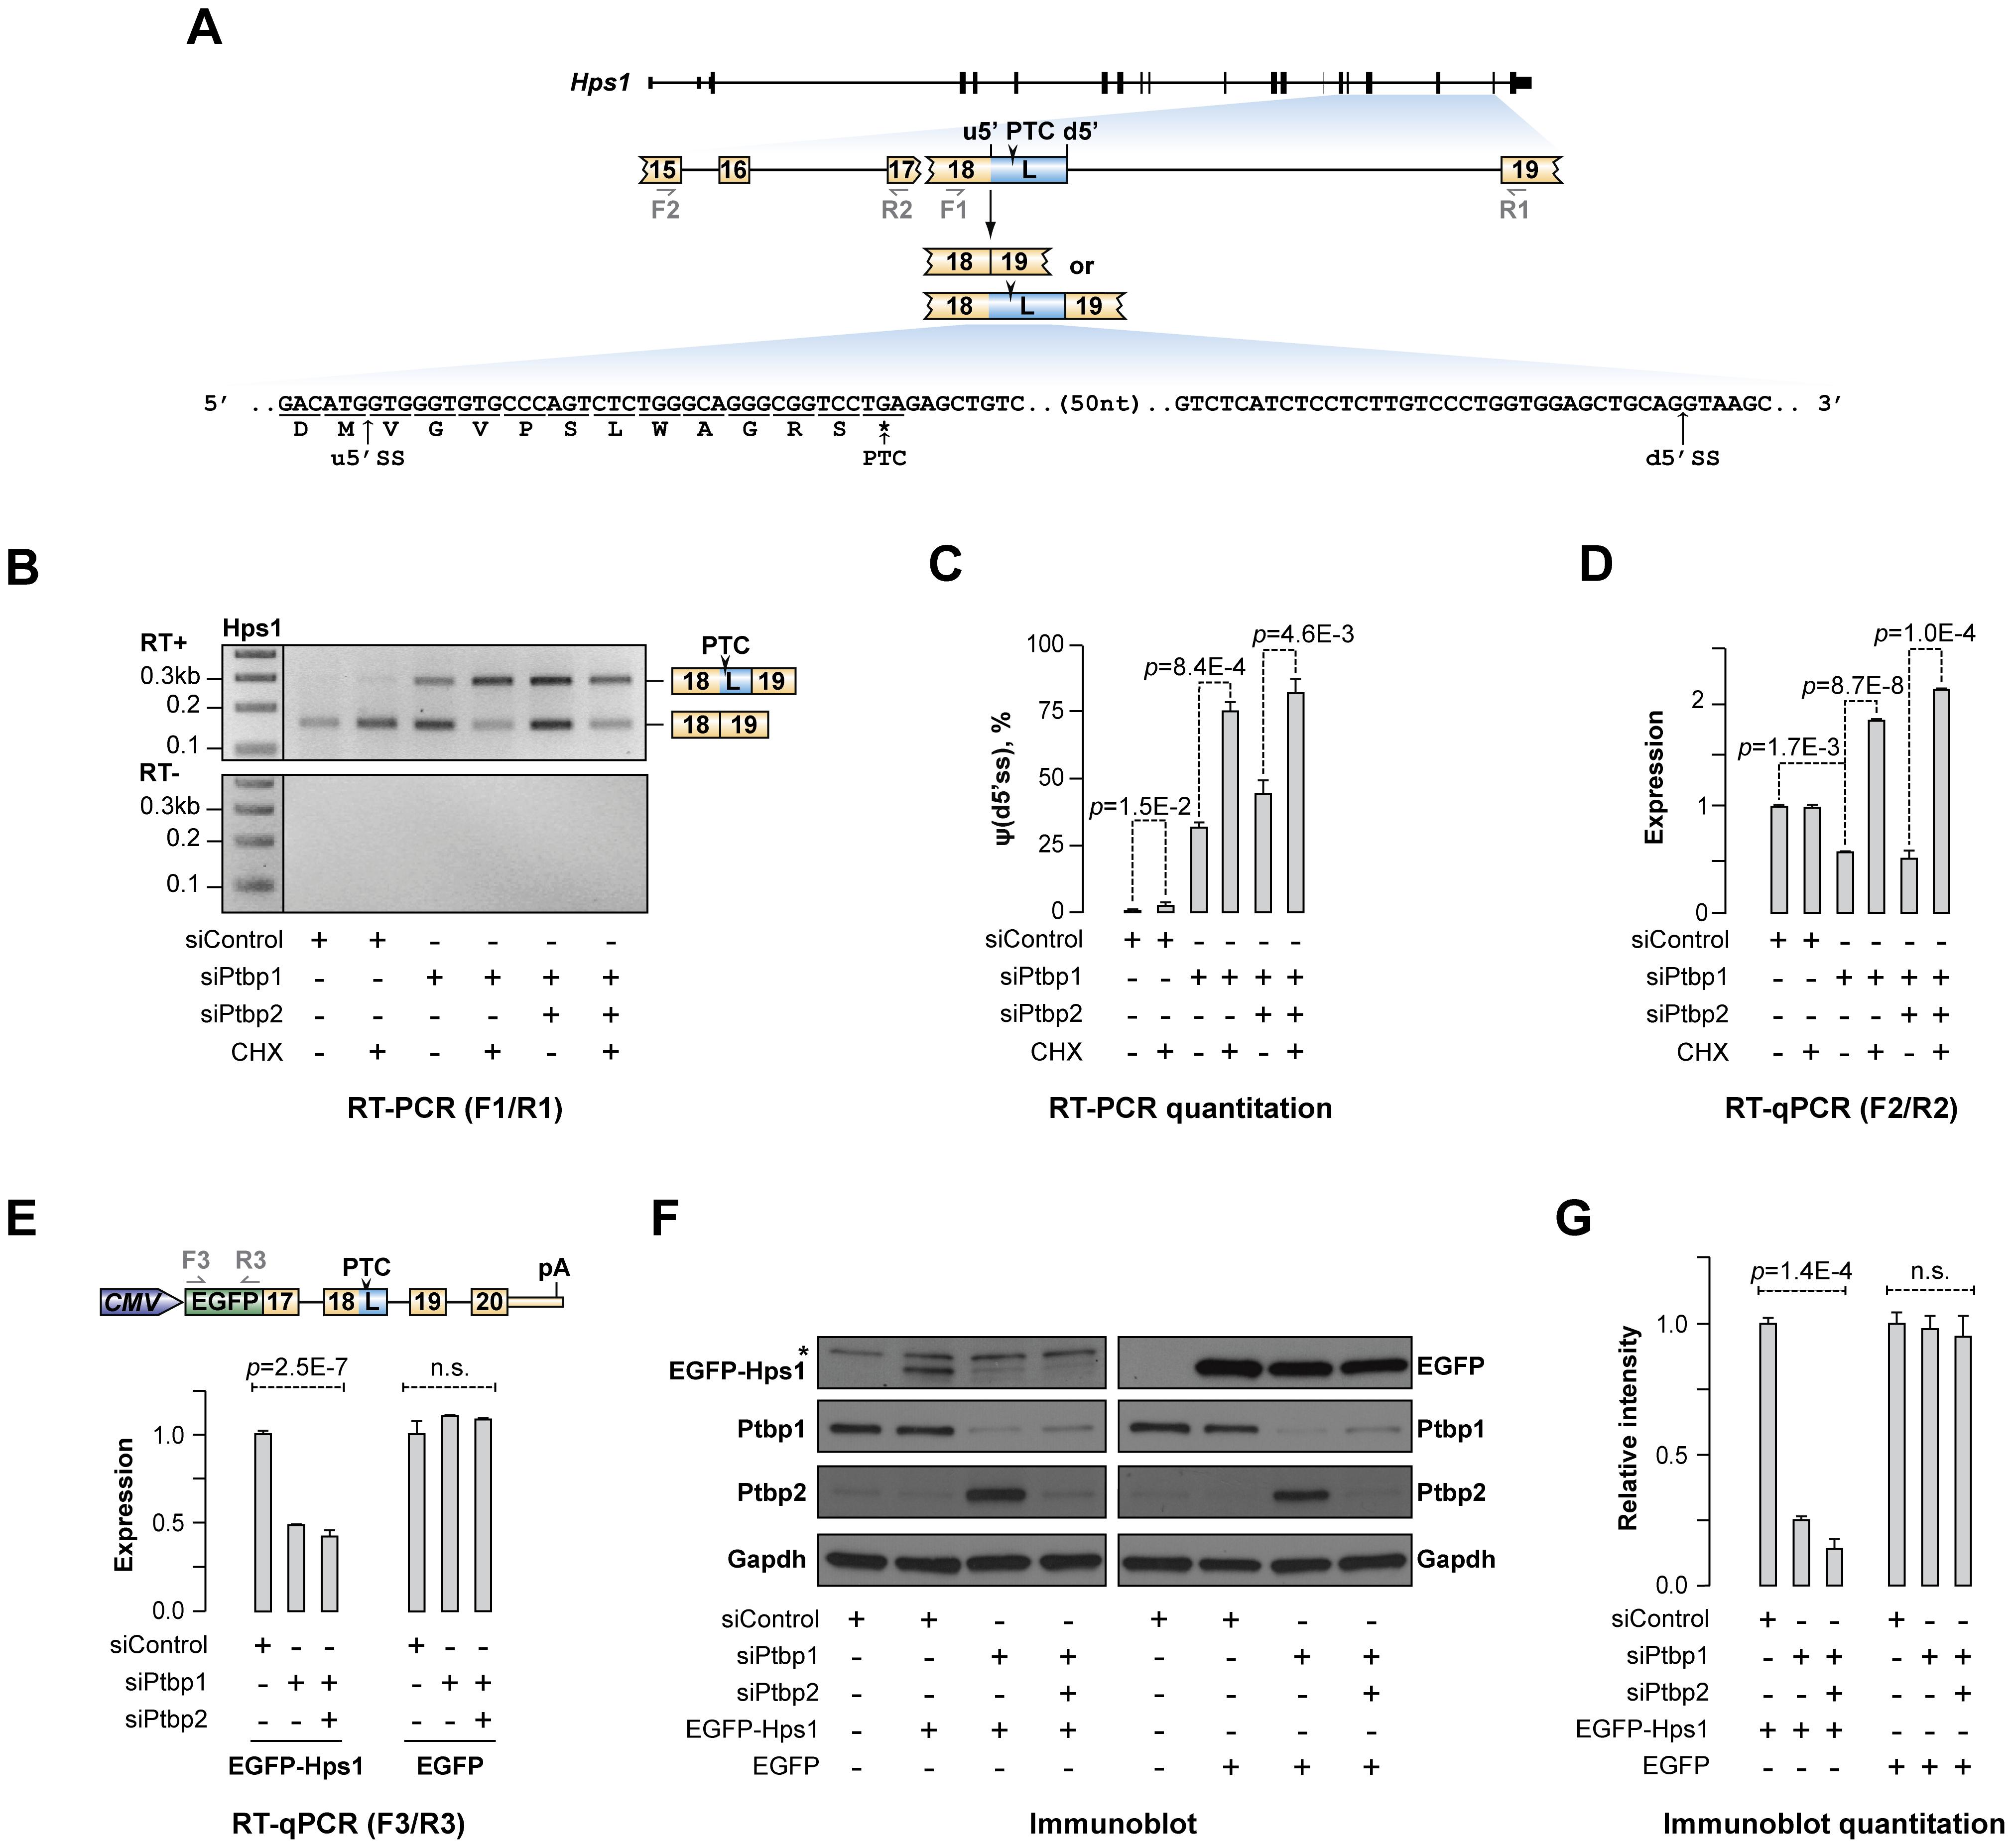 Ptbp1 regulates Hps1 mRNA abundance through AS-NMD.